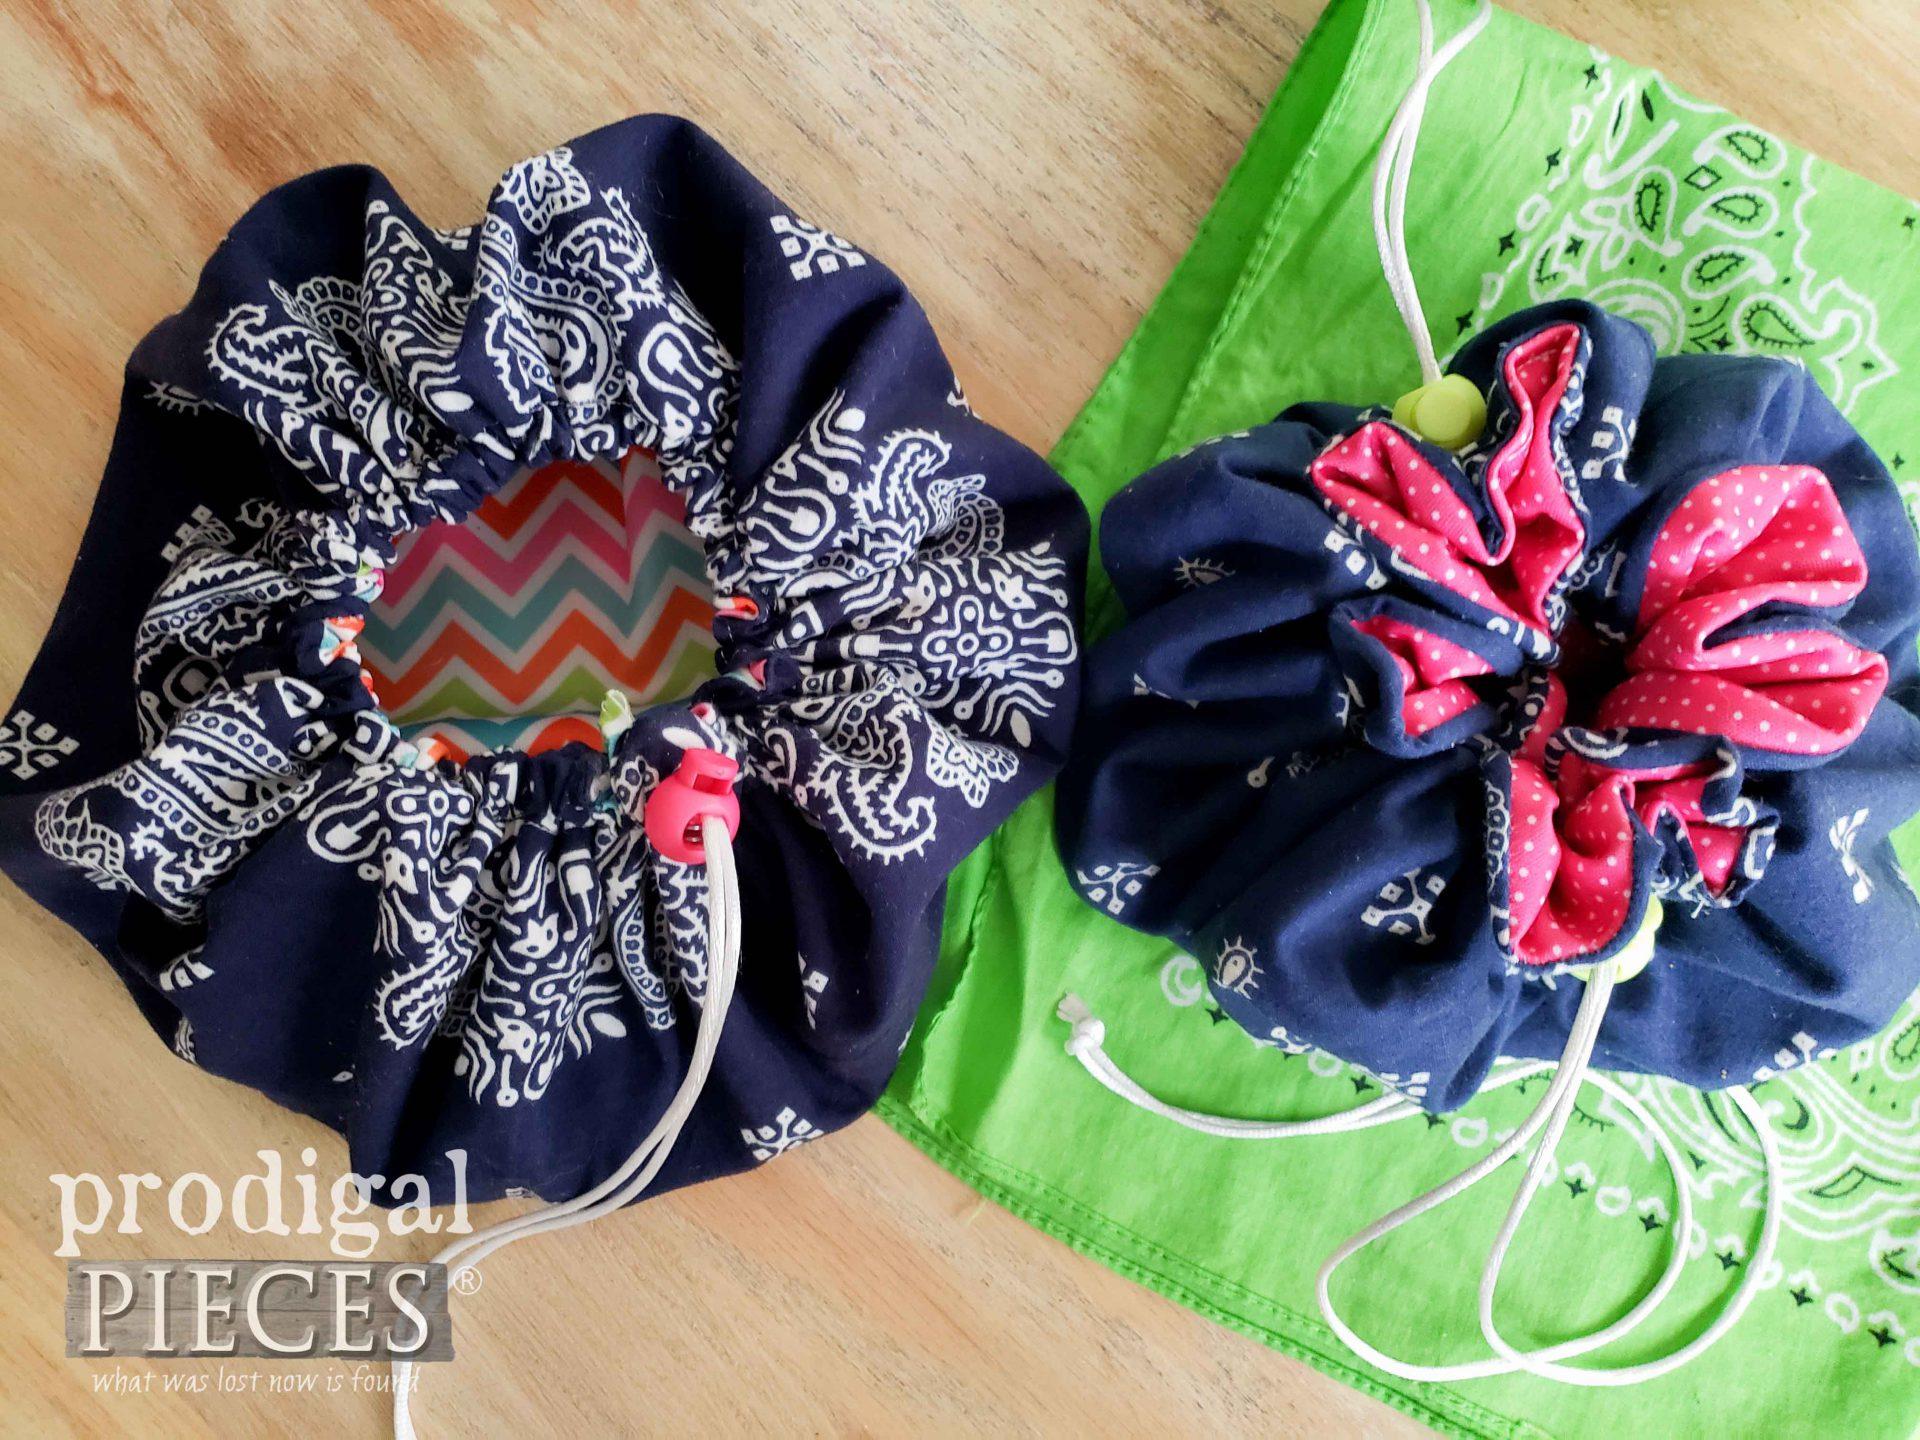 Drawstring Bag Side-by-Side Comparison   prodigalpieces.com #prodigalpieces